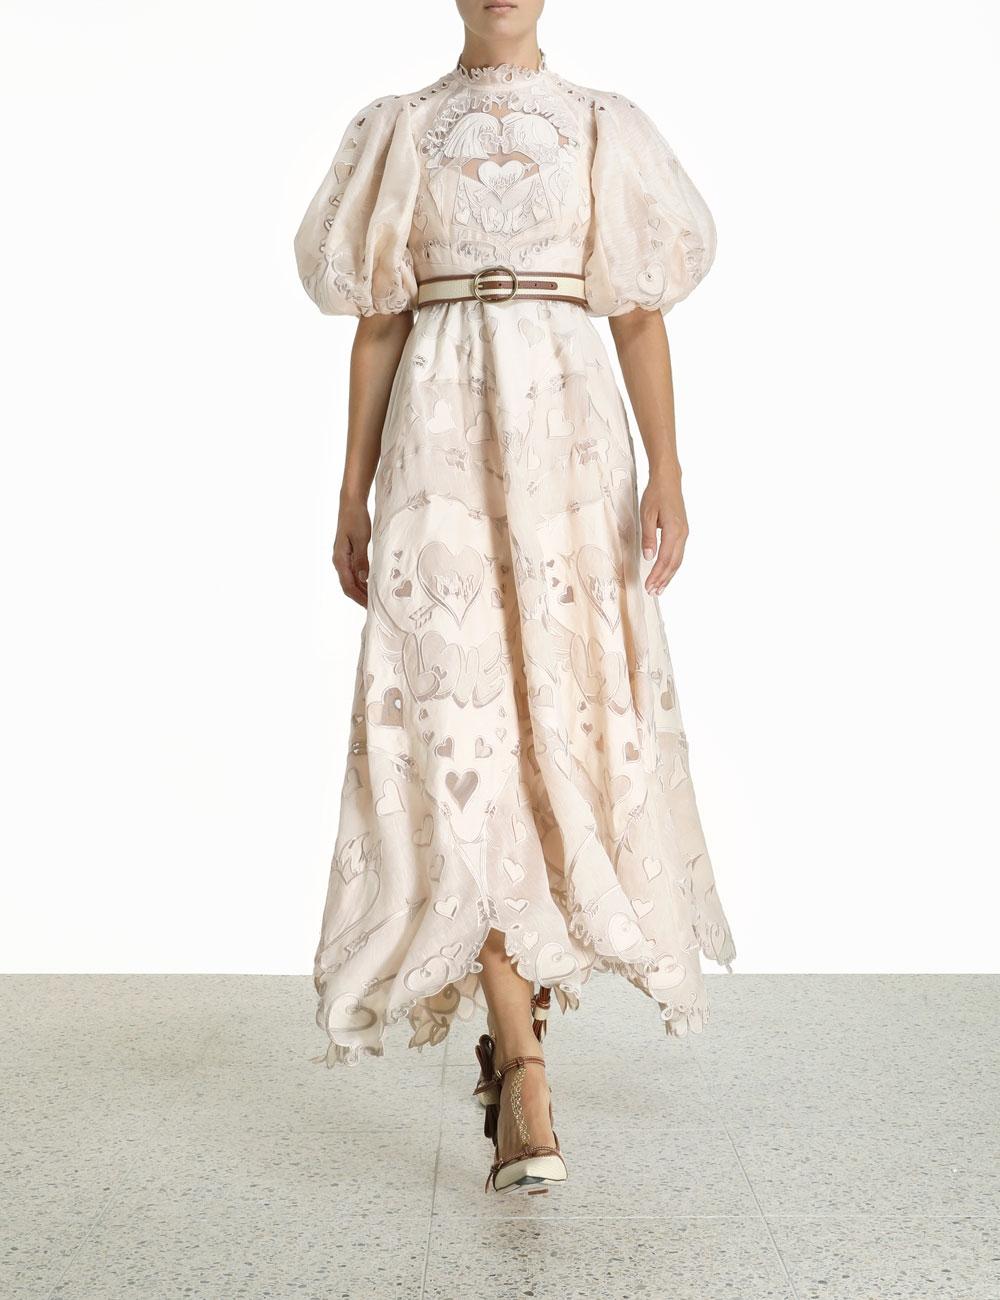 The Lovestruck Gown